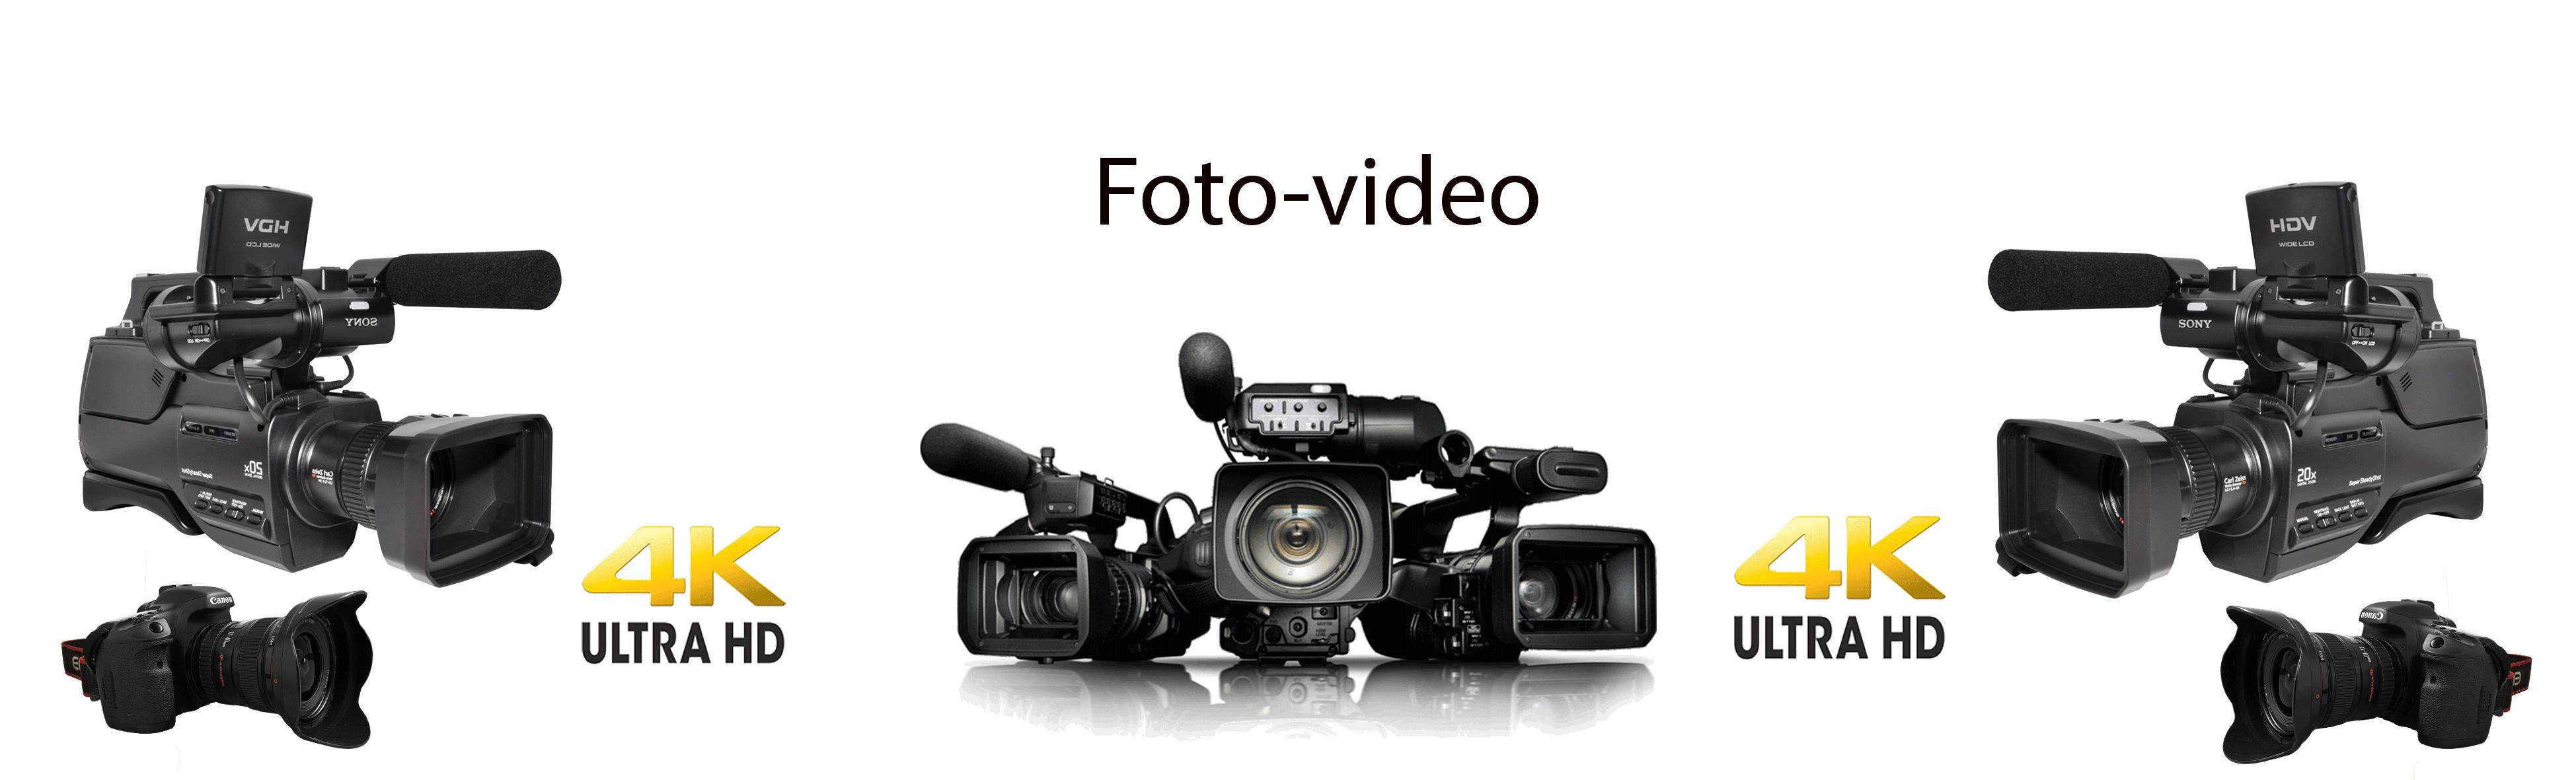 foto video